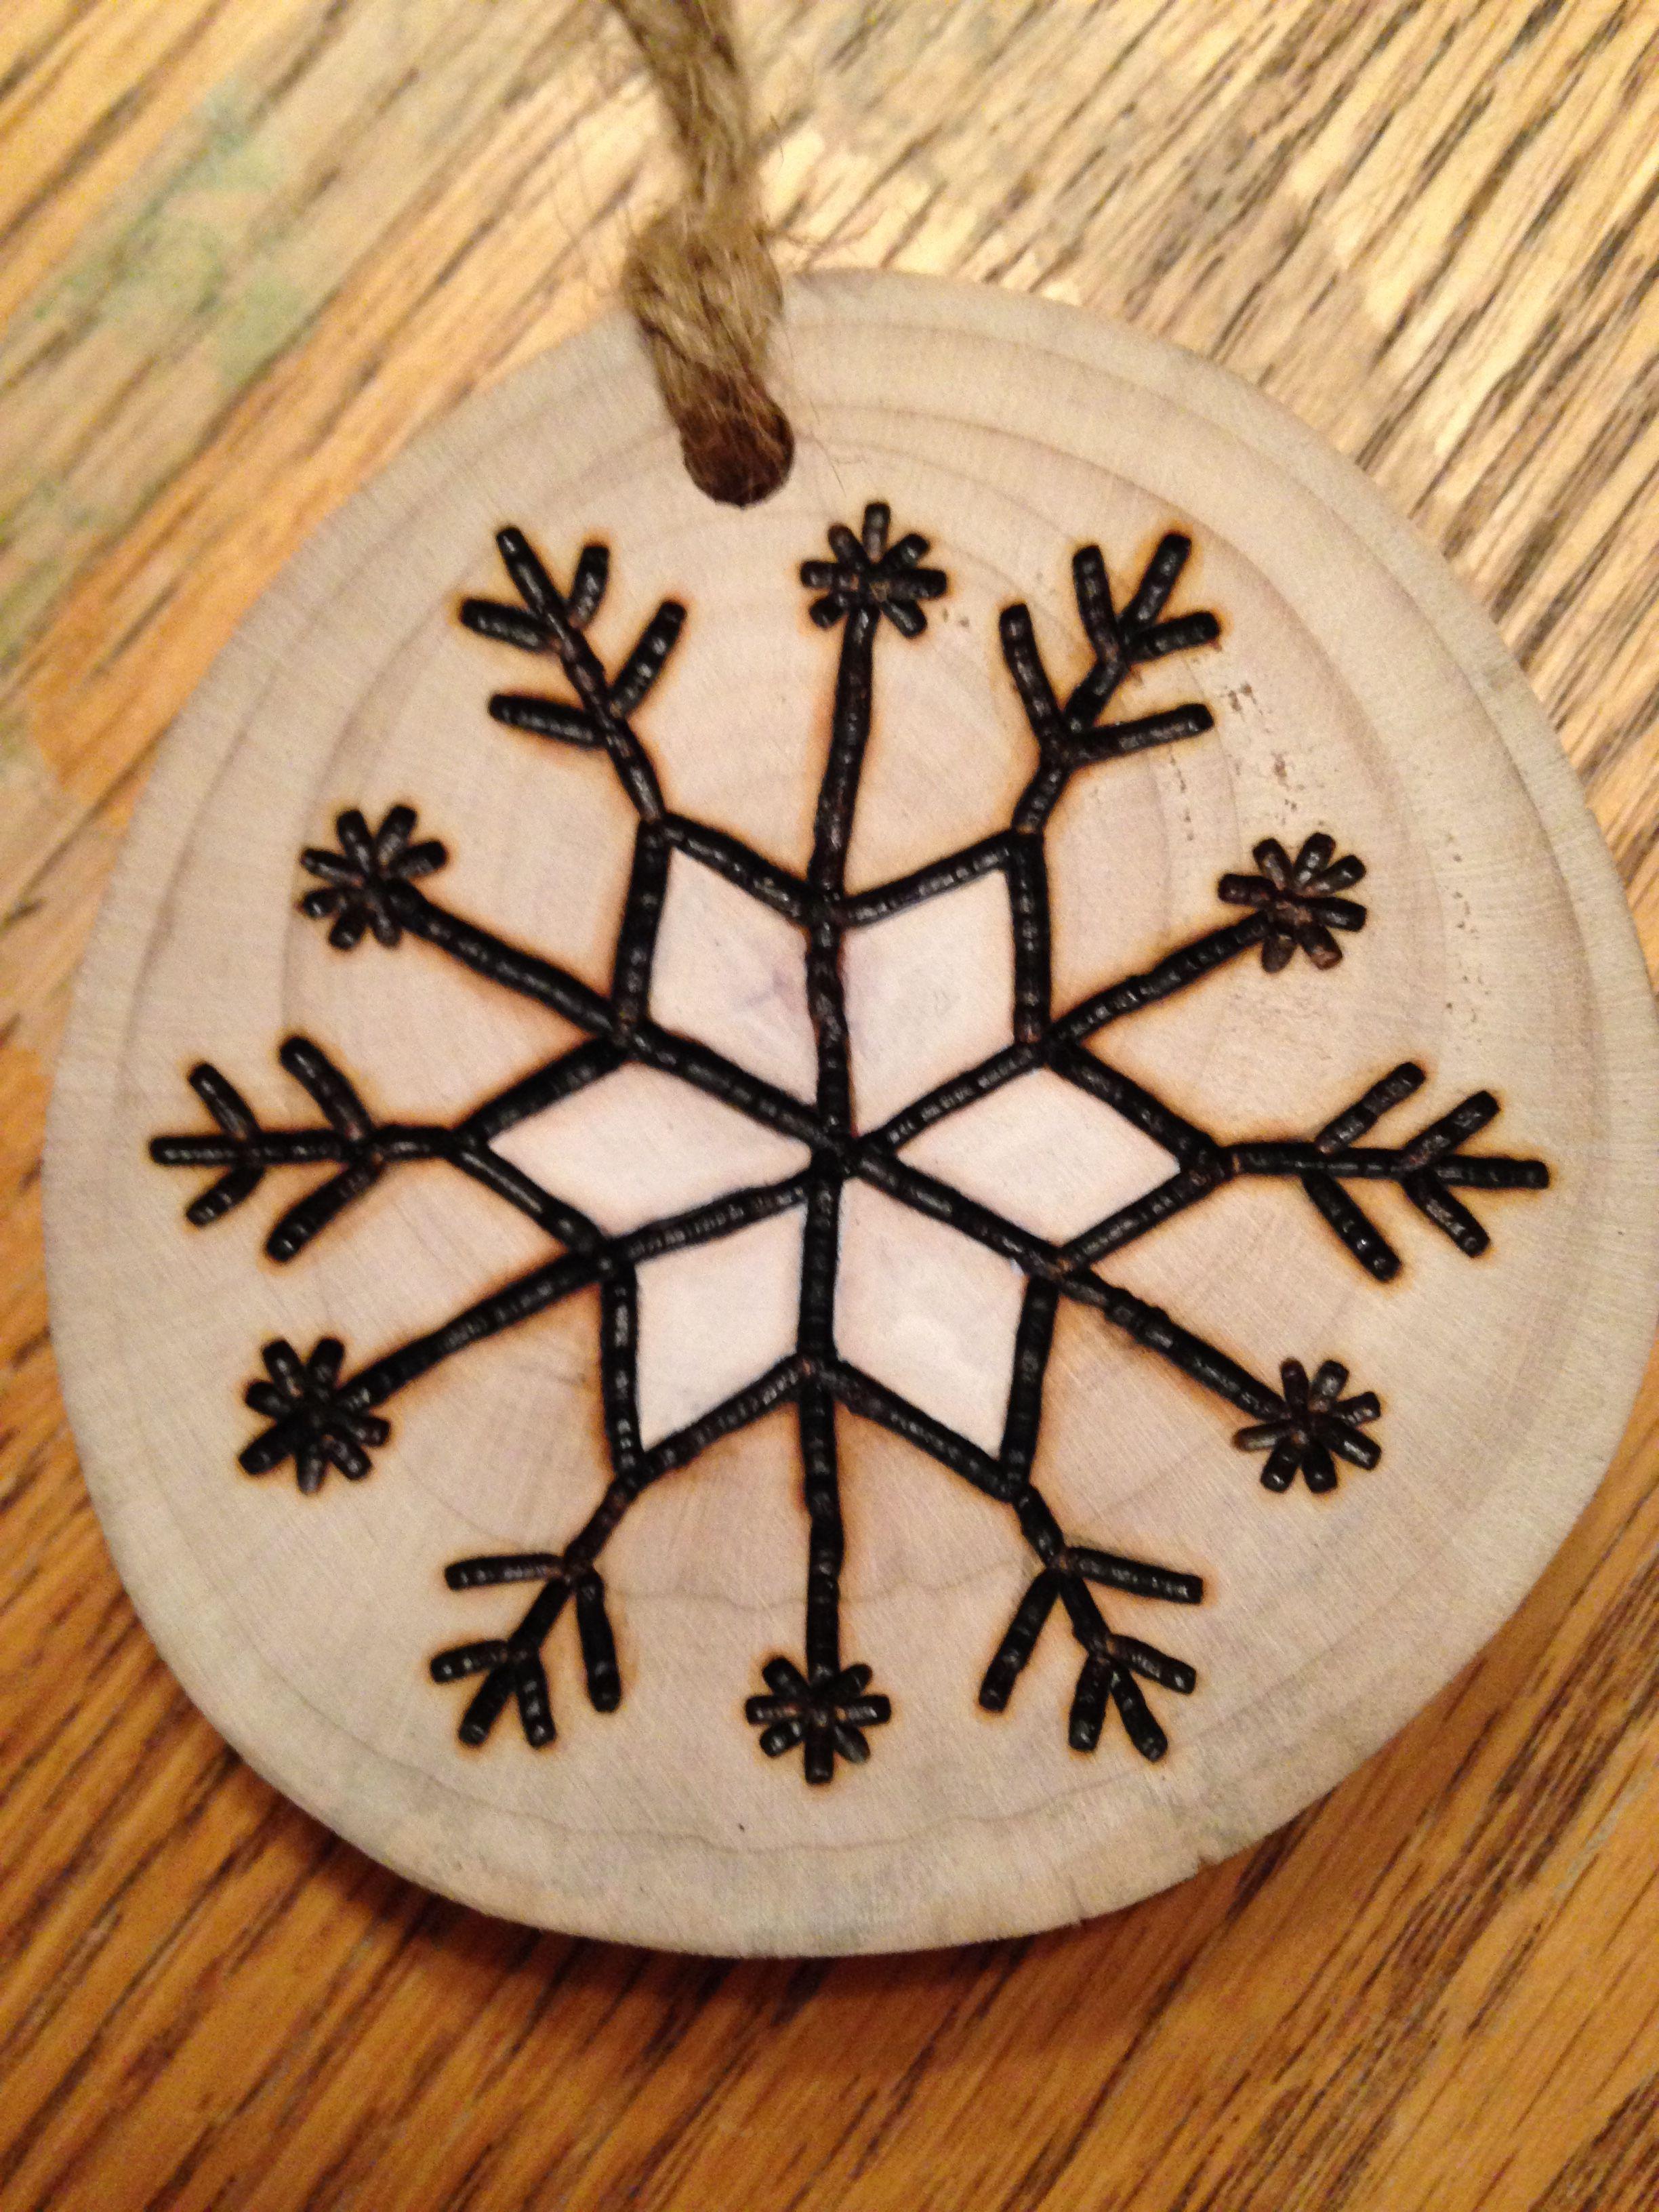 Rustic Snowflake wood burned Christmas ornament natural wood